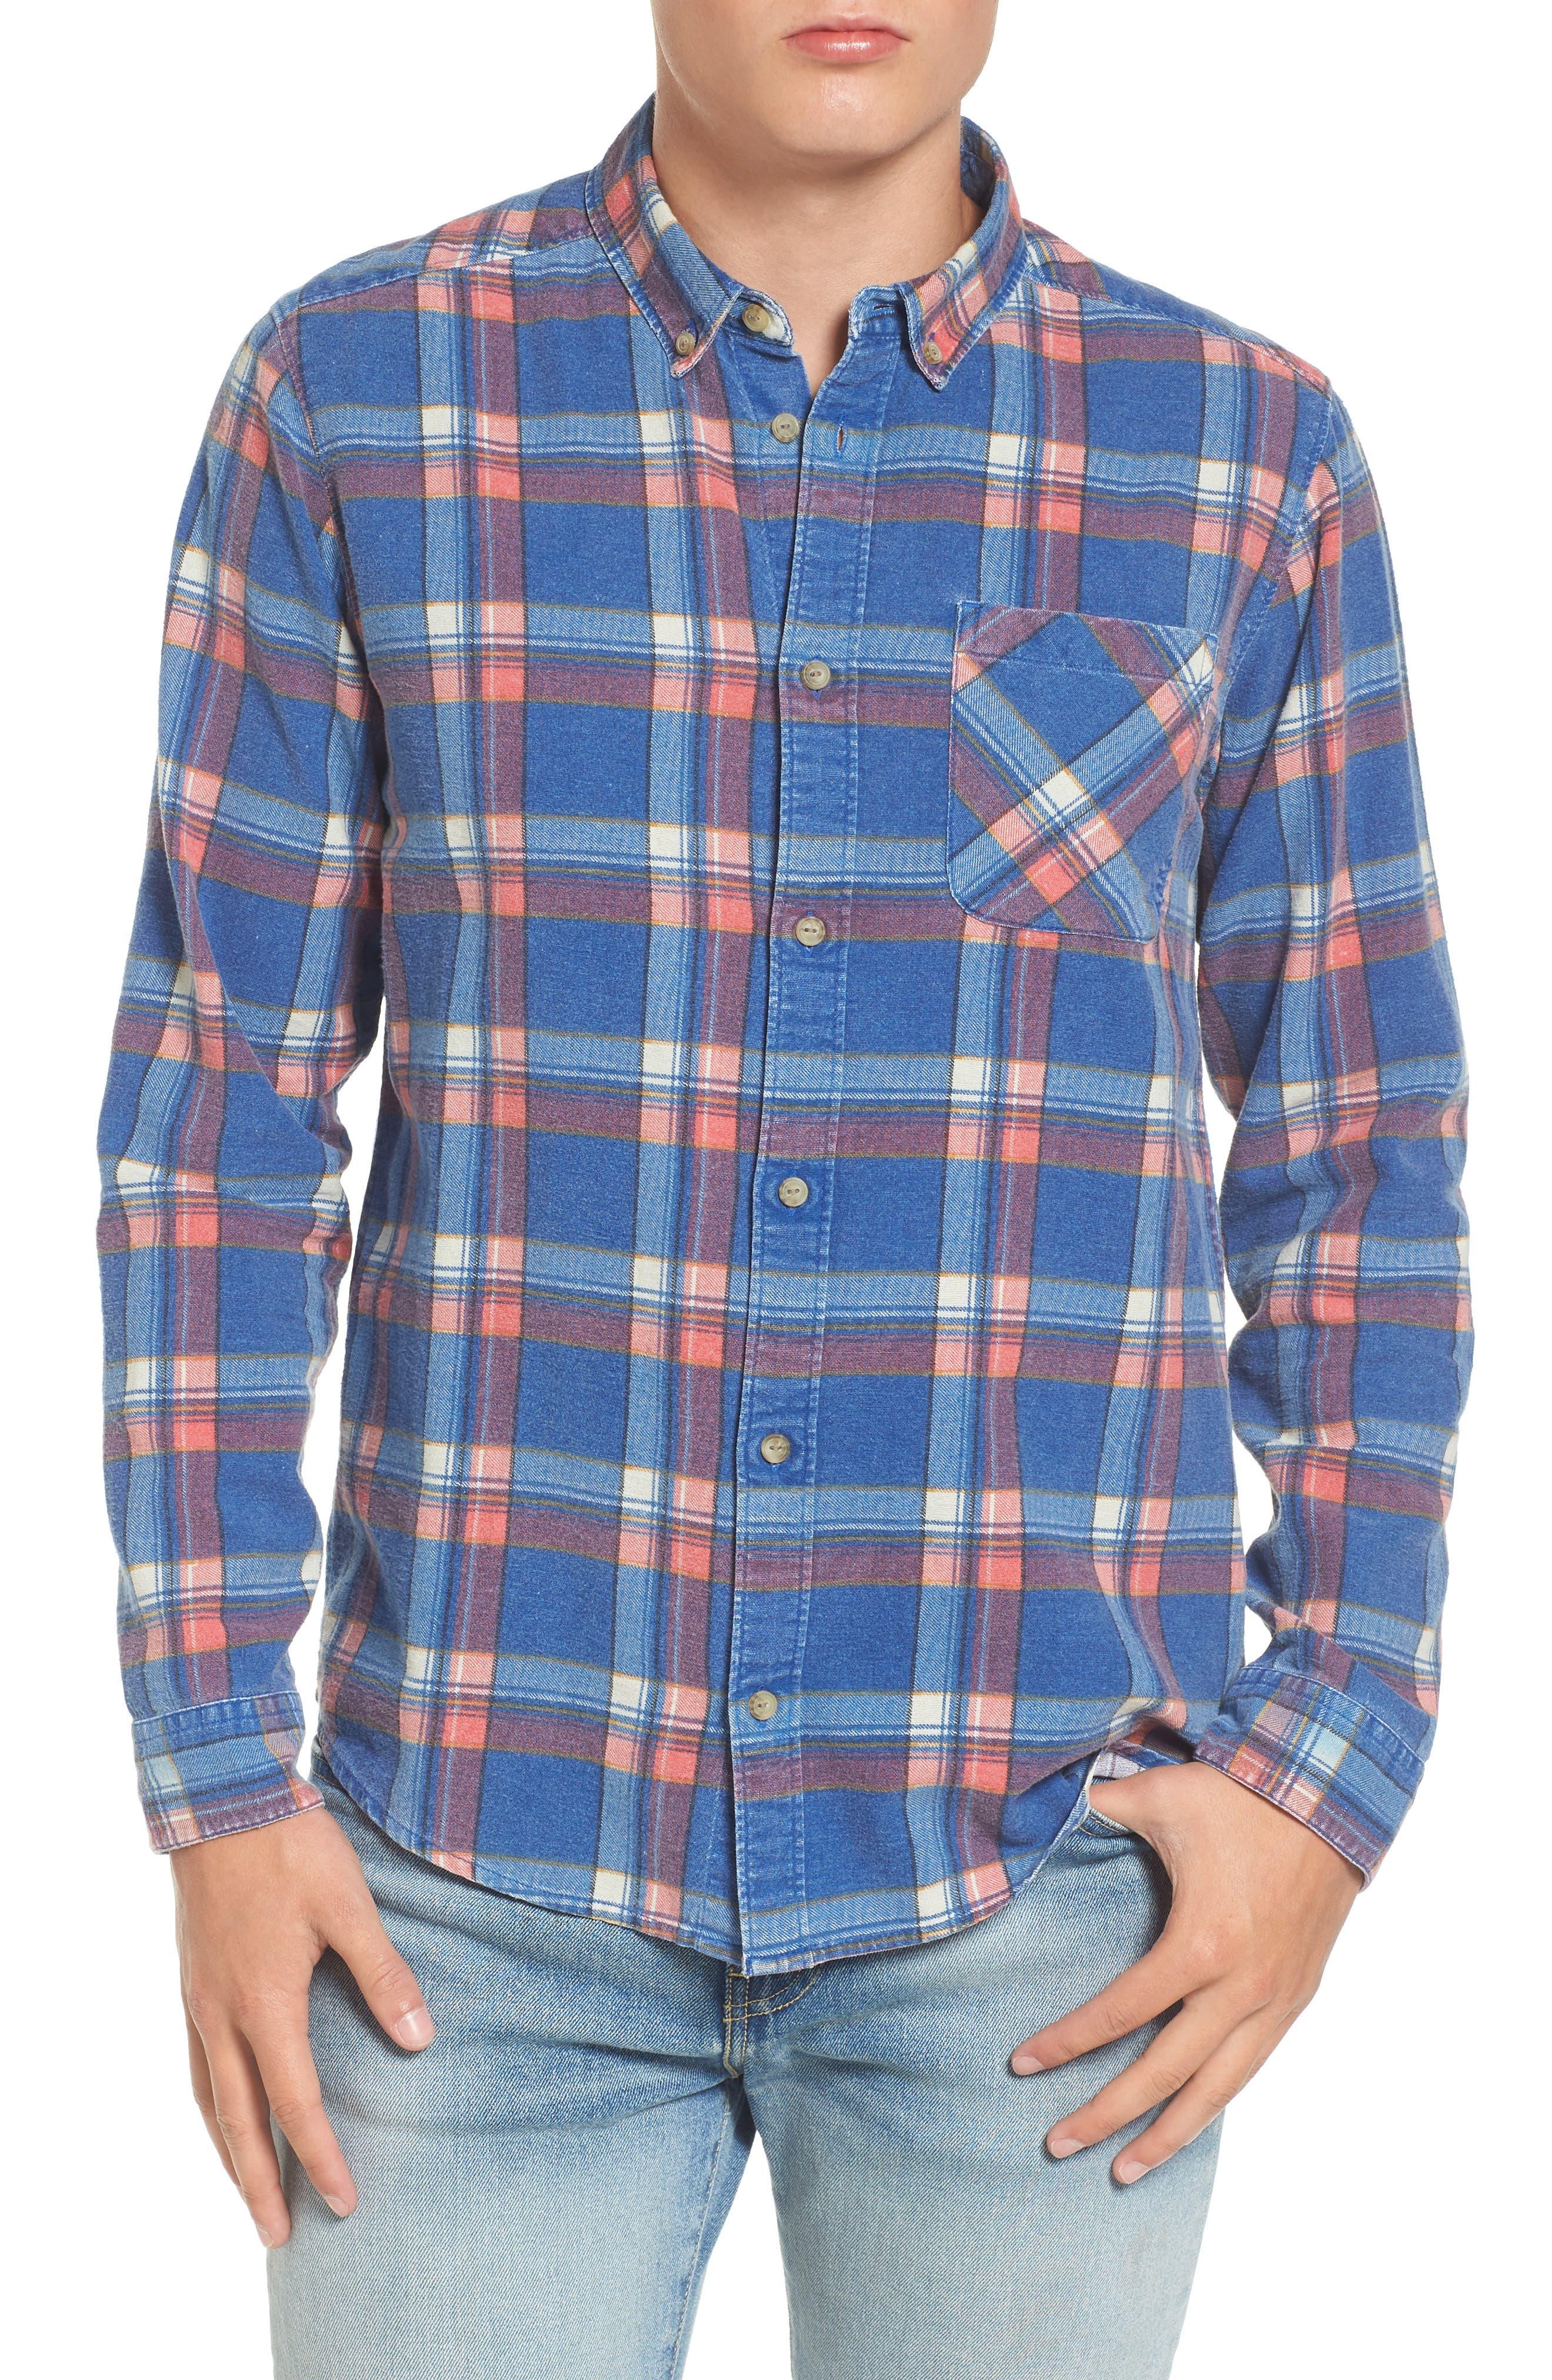 x Kevin Long Plaid Shirt,                         Main,                         color, 462